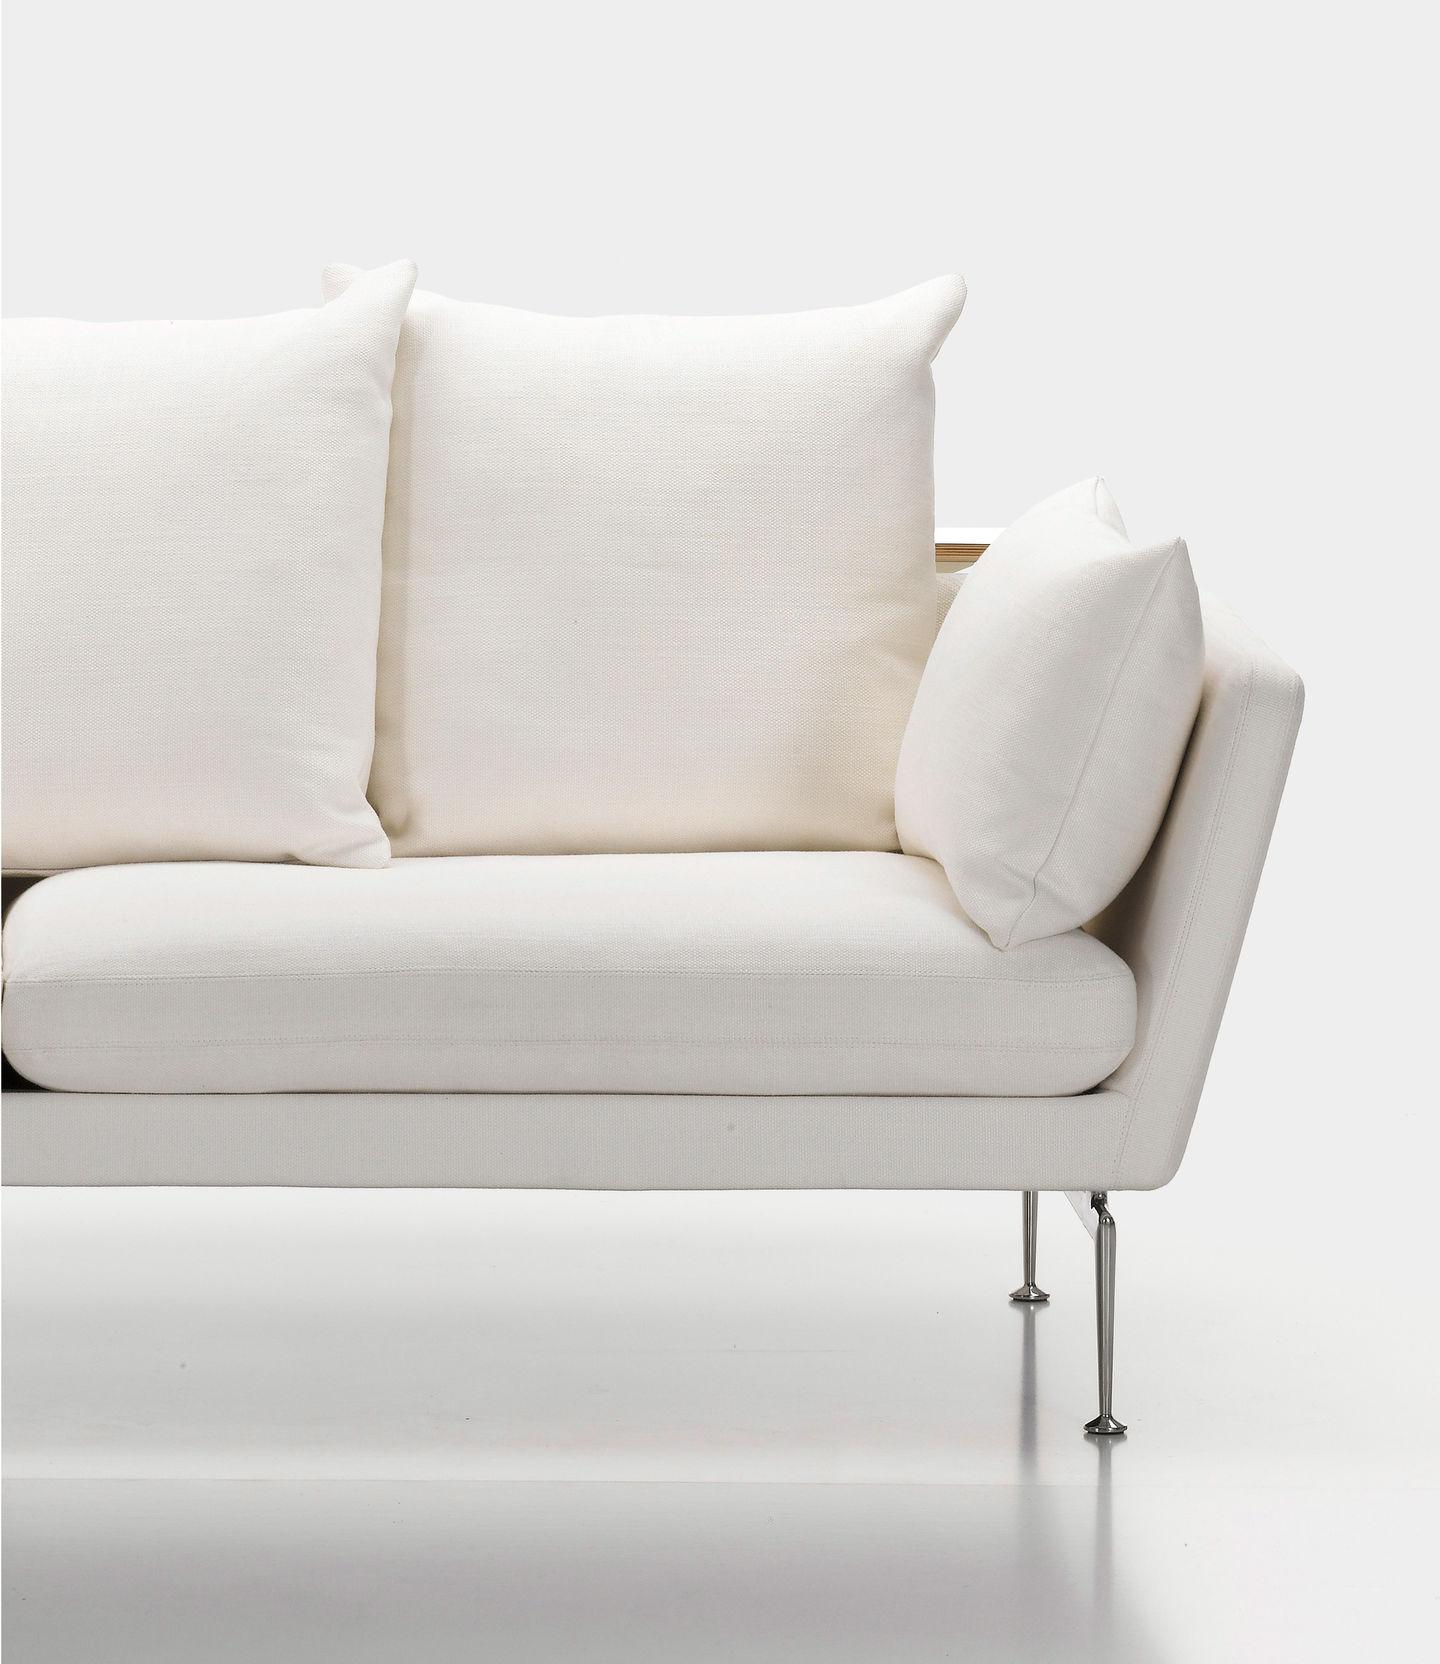 Types Of Upholstery The Elegant Suita Sofa